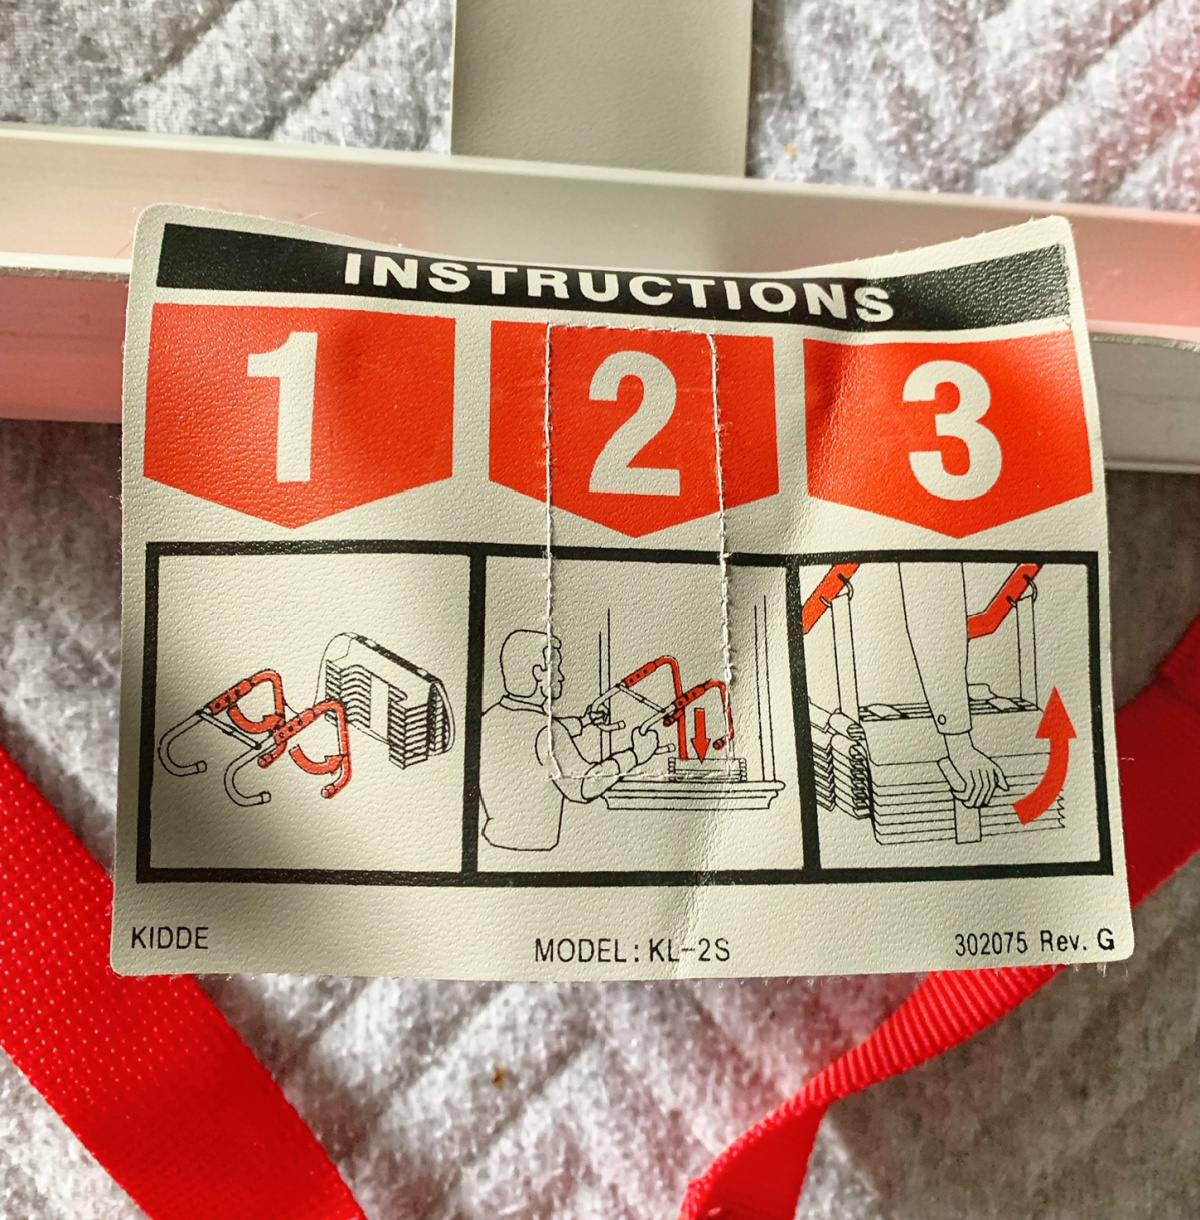 Kidde Fire Safety Ladder Instructions